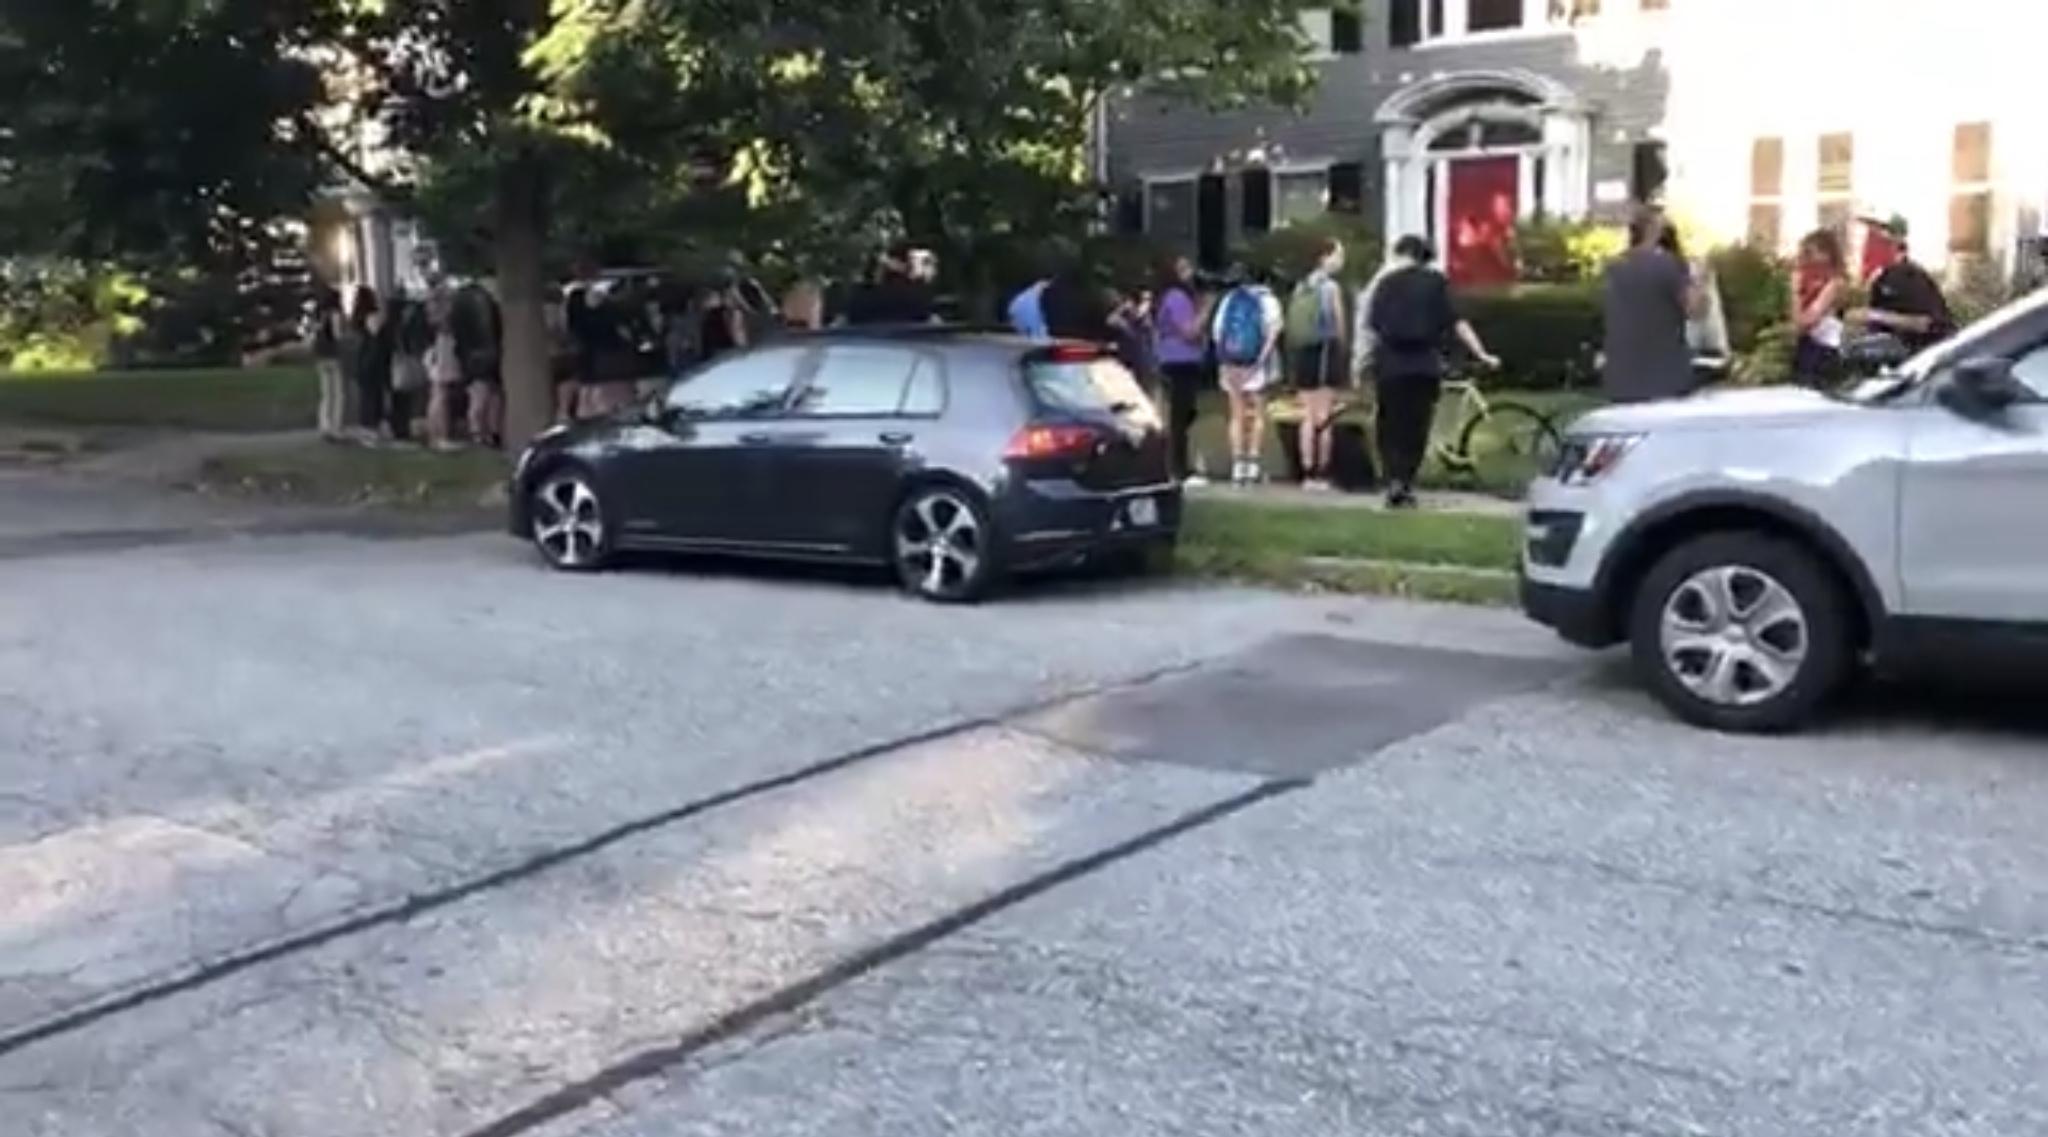 Video: Defund police protesters again at Raimondo house